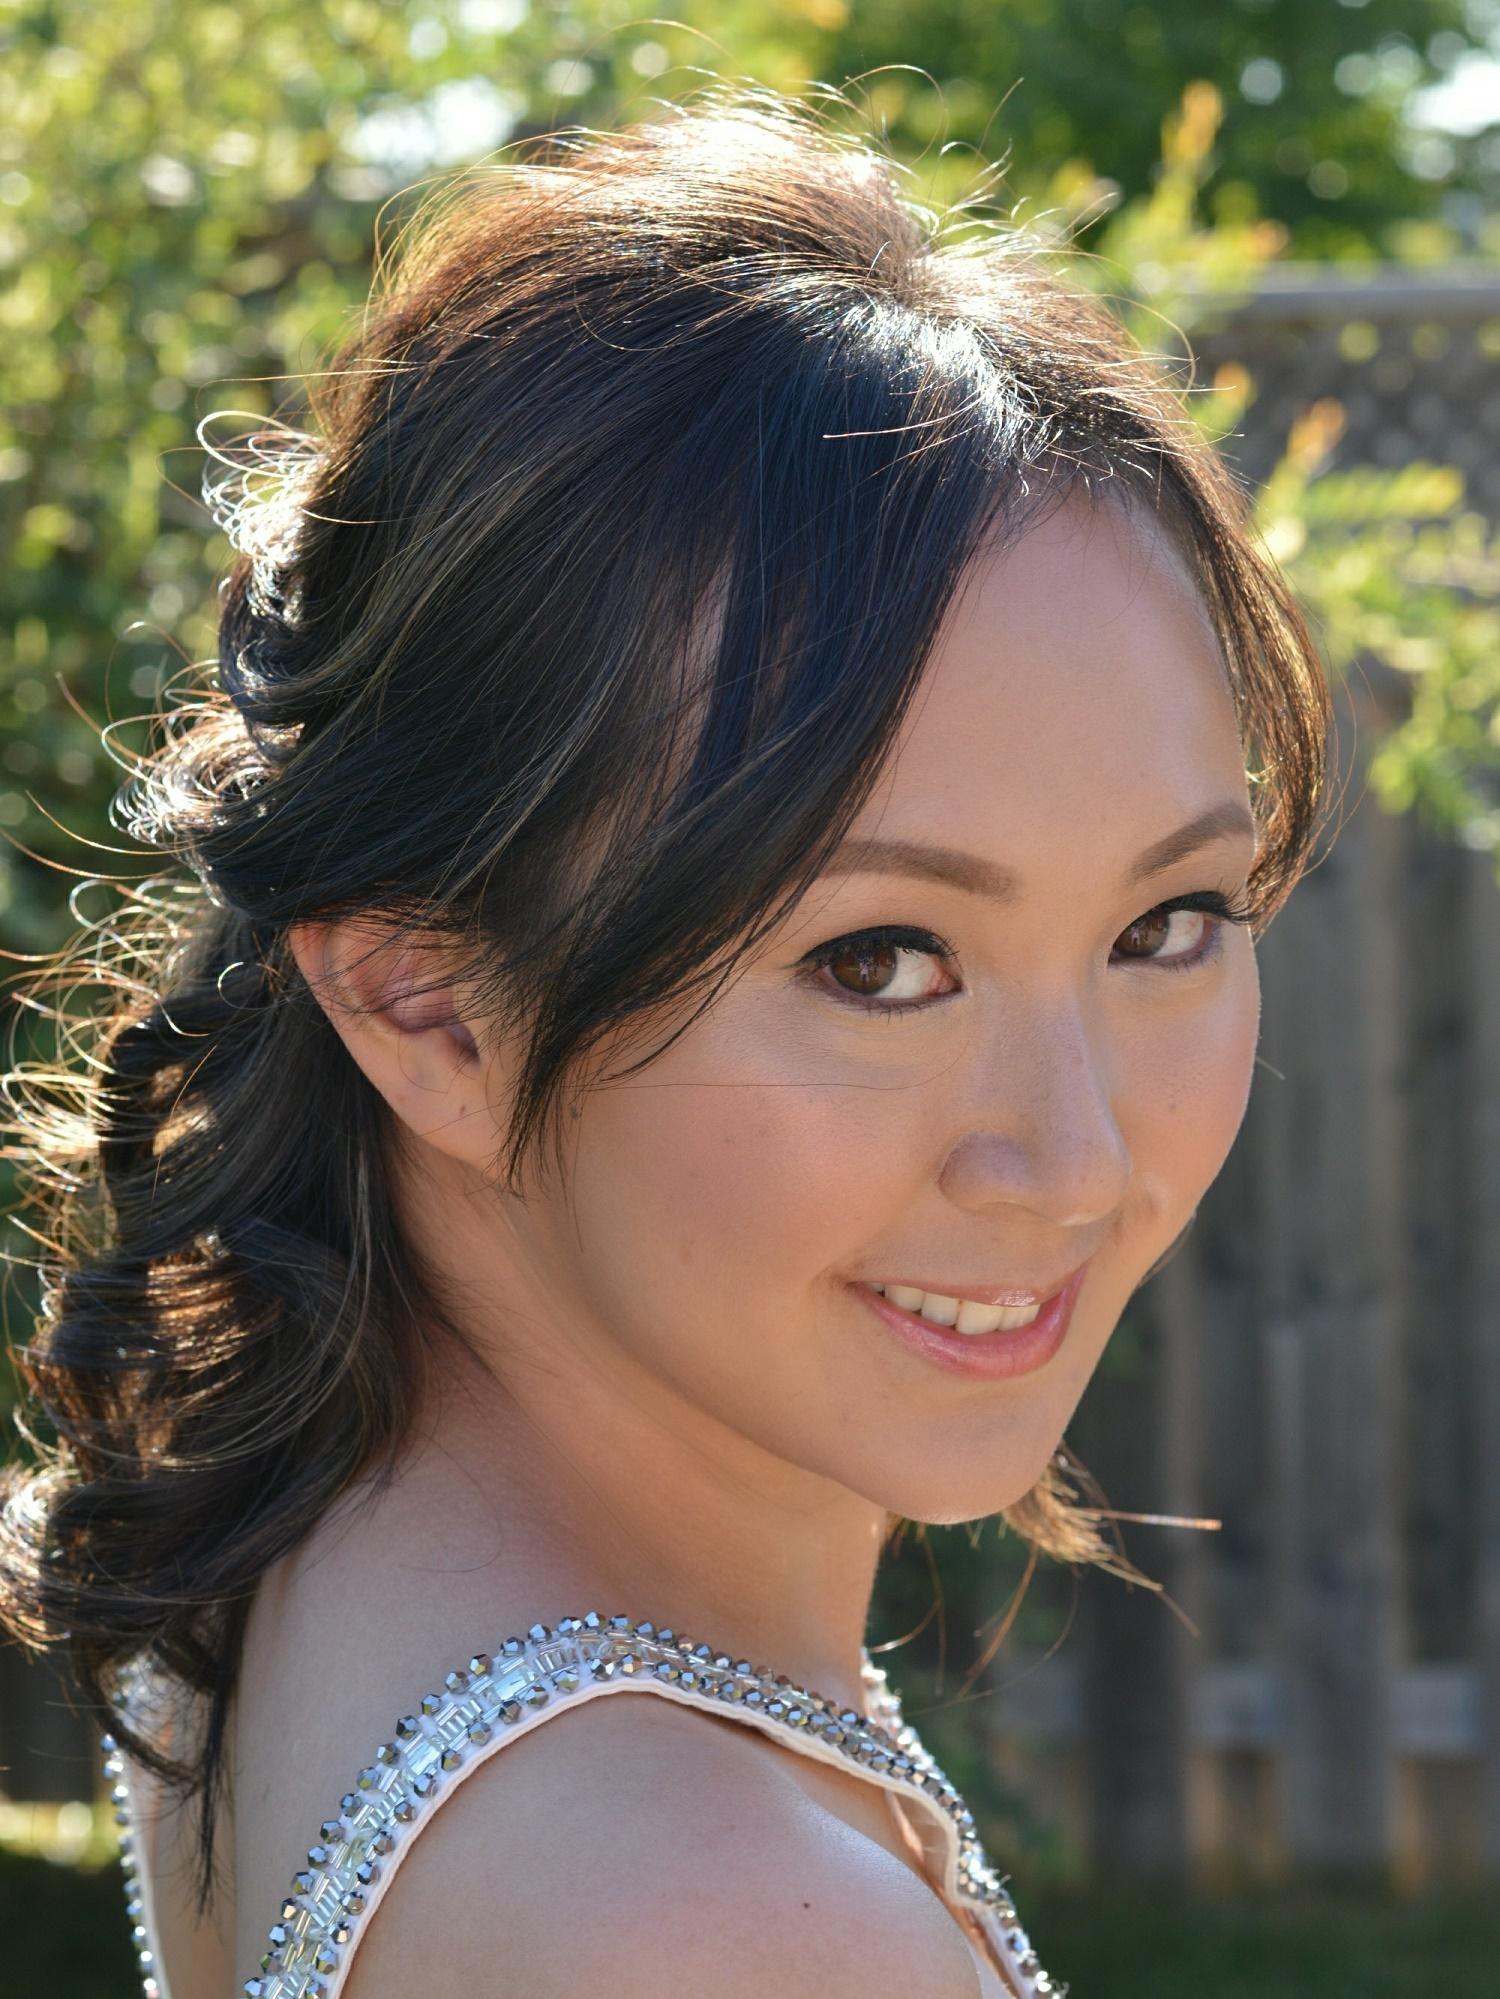 Chinese bride makeup and hair Toronto